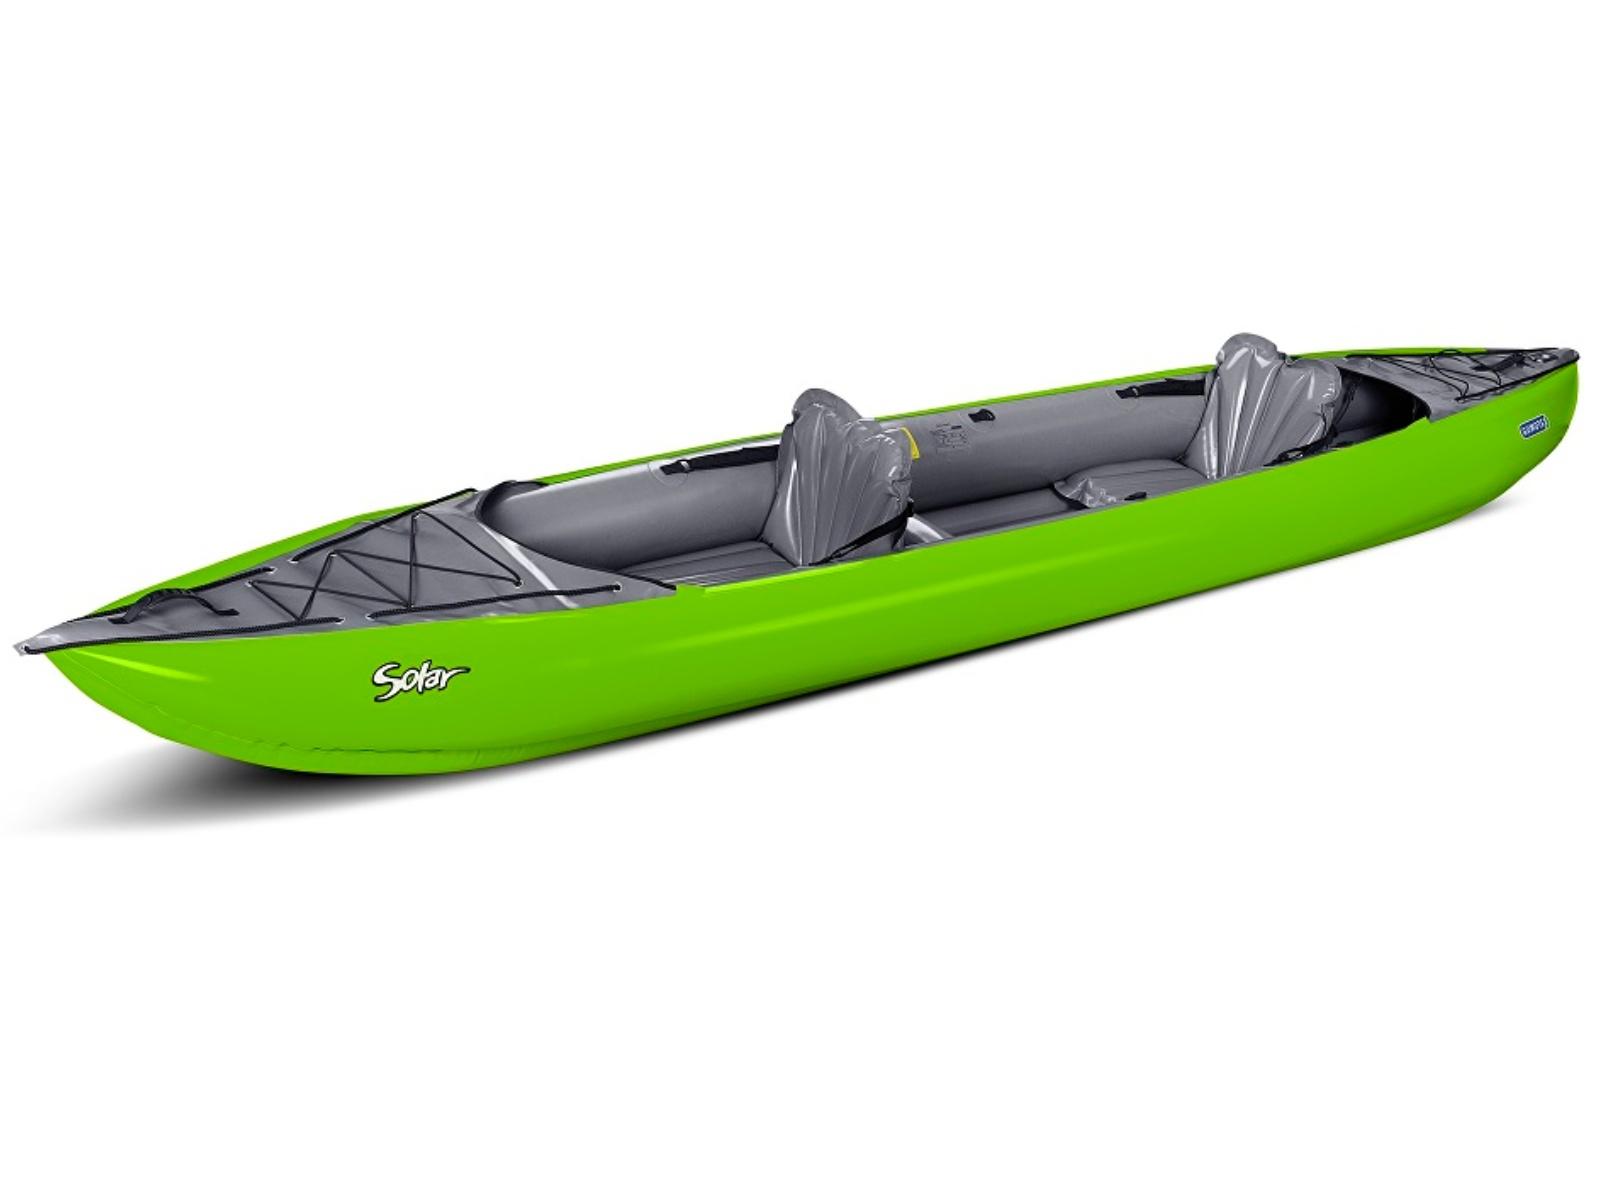 Nafukovací kajak GUMOTEX Solar 2 zeleno-šedý